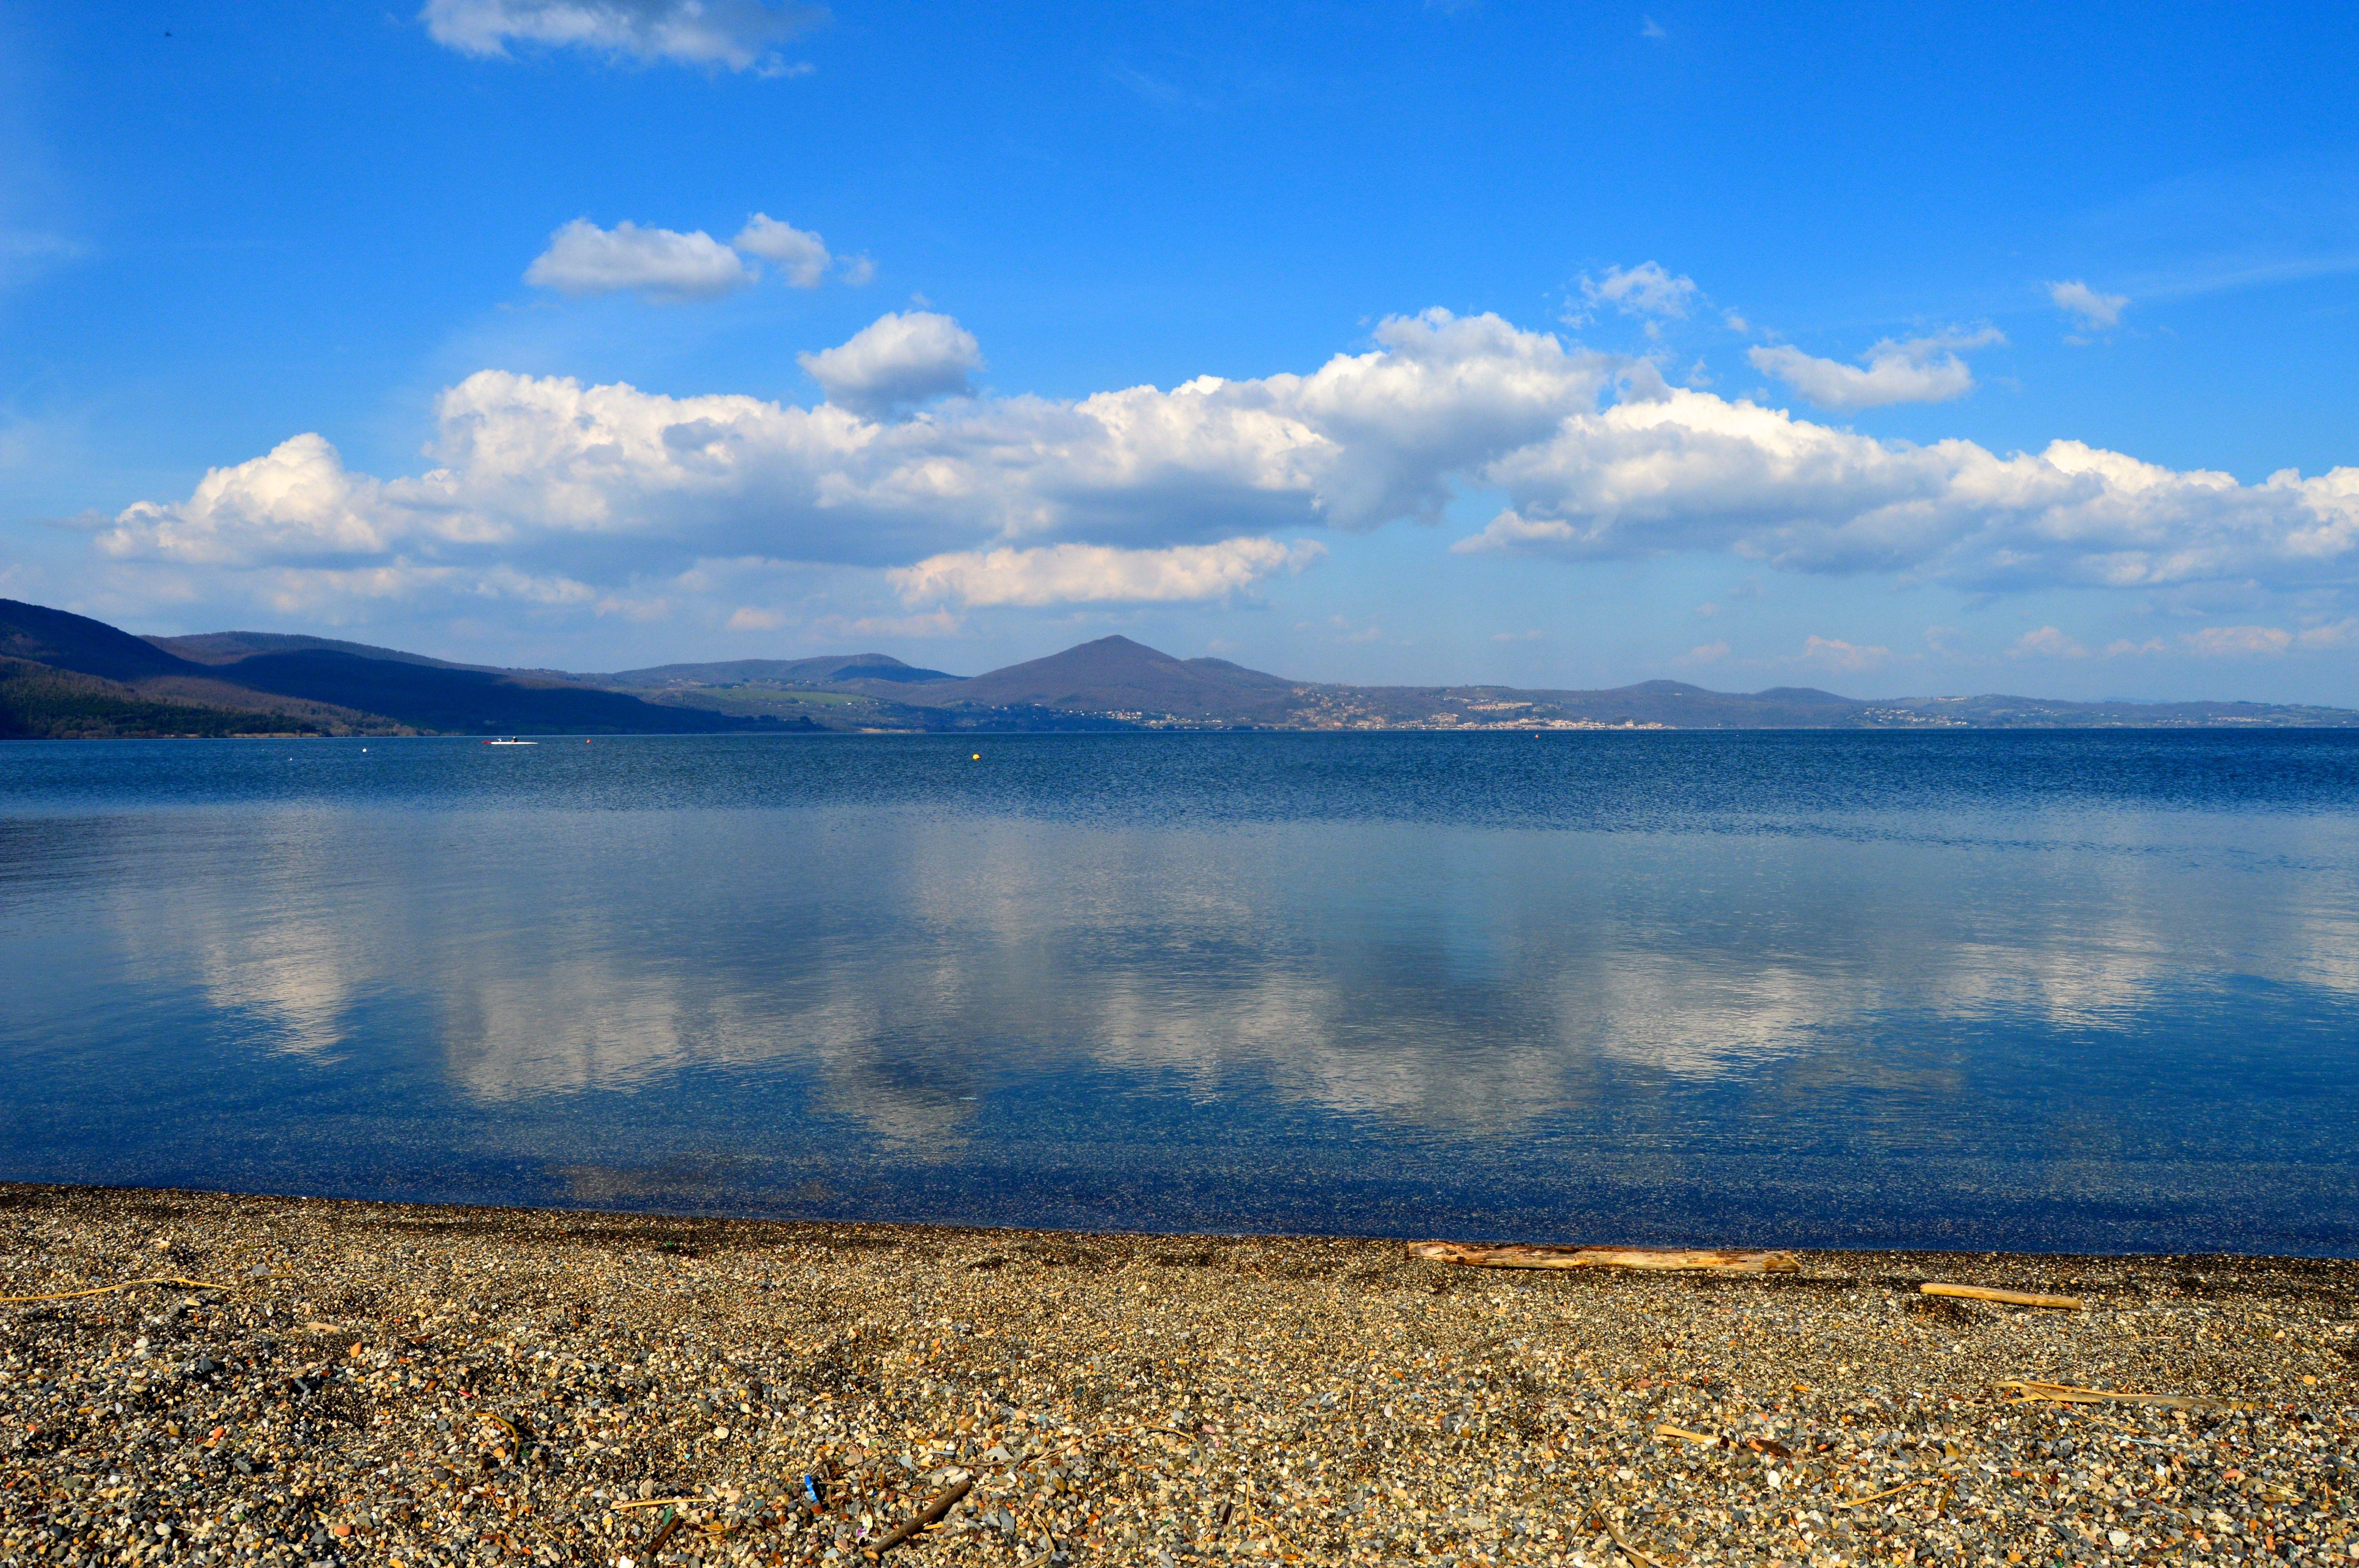 Lake Bracciano In Bracciano Italy Lake